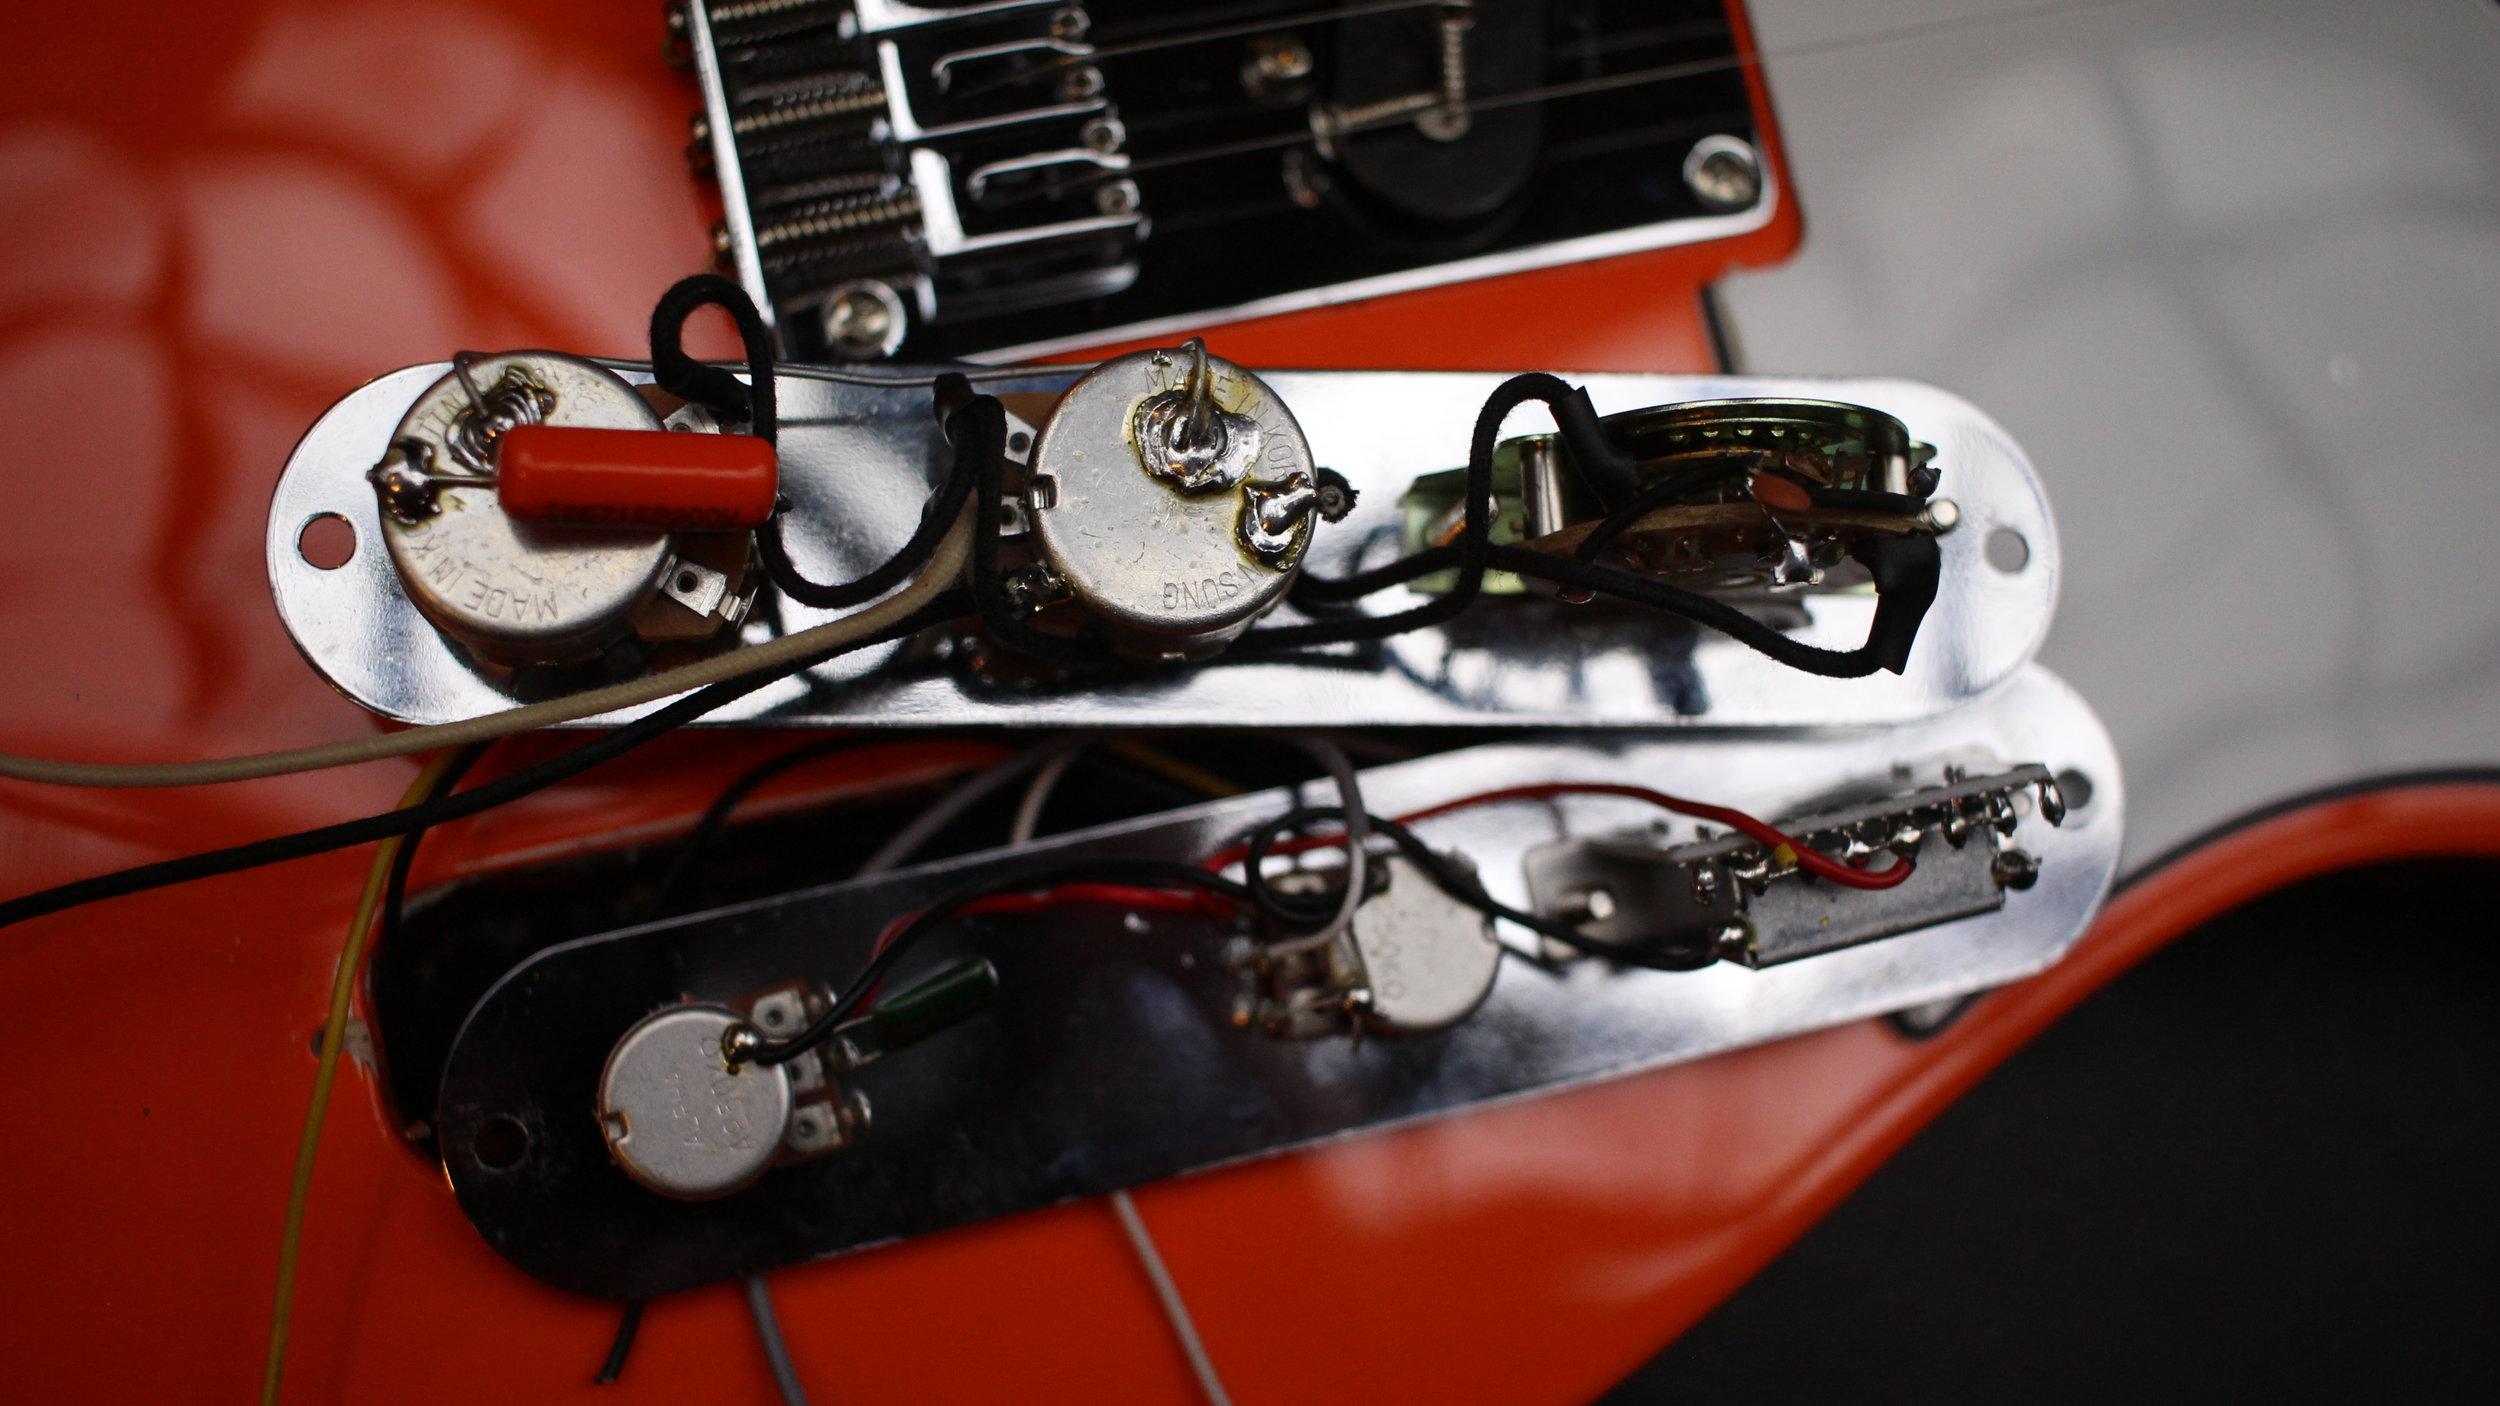 Squier affinity Telecaster Wiring vs Gunstreet wiring